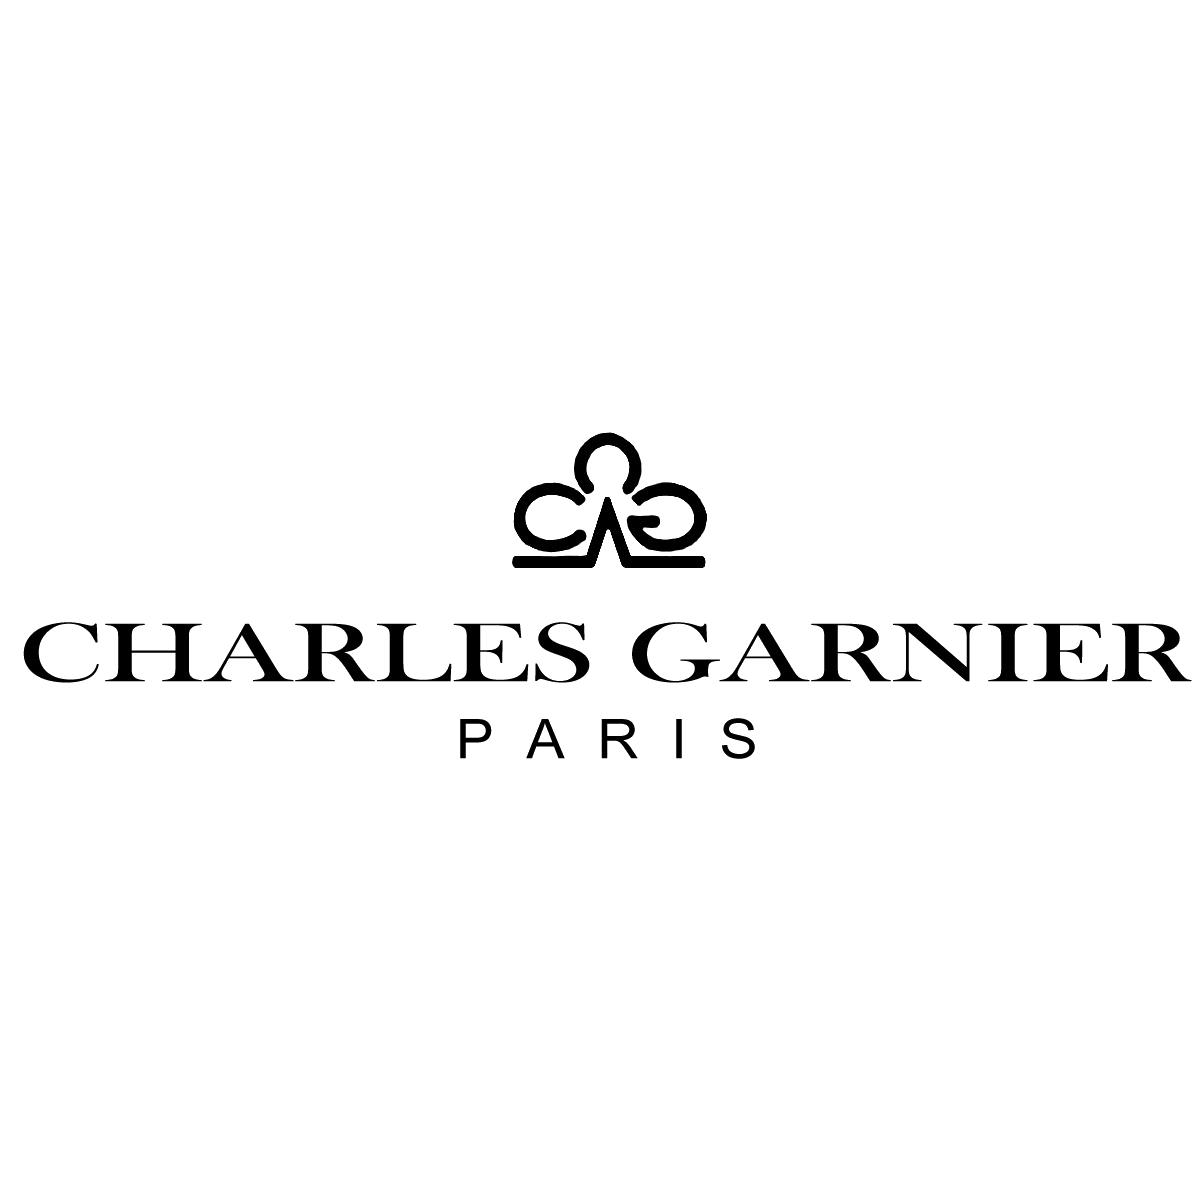 paris-logo copy.png